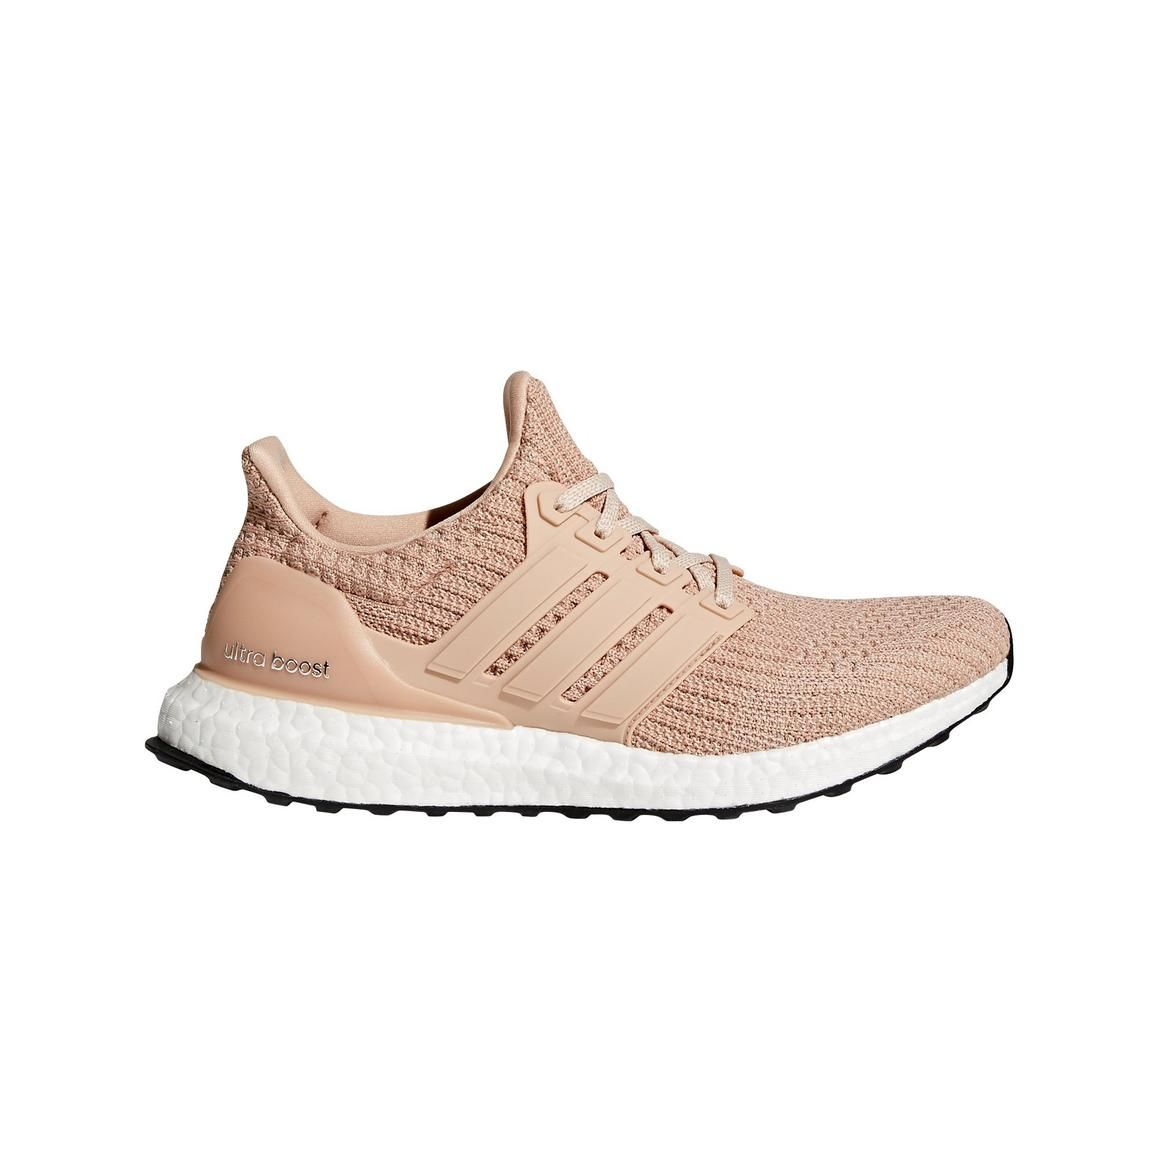 "adidas Ultra Boost 4.0 ""Ash Pearl"" Women's Running Shoe"